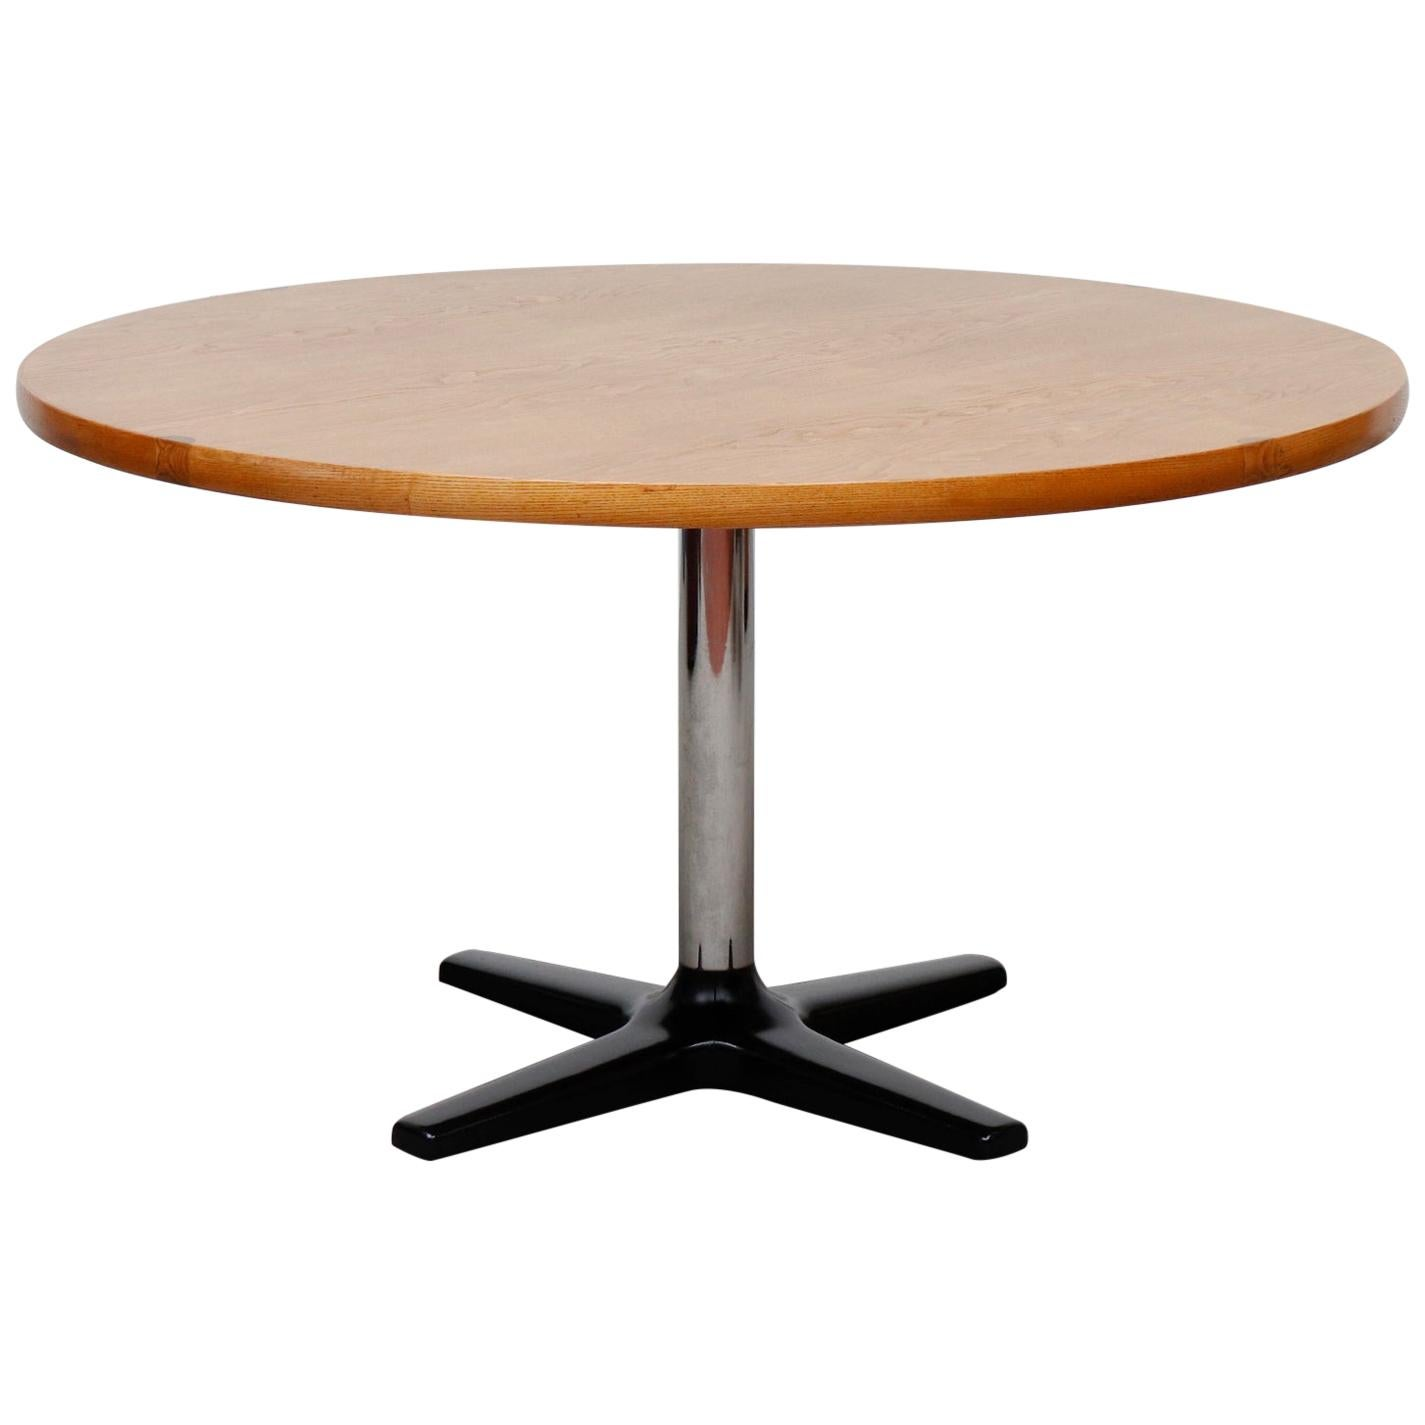 Rare Pastoe Round Oak Pedestal Dining or Center Table